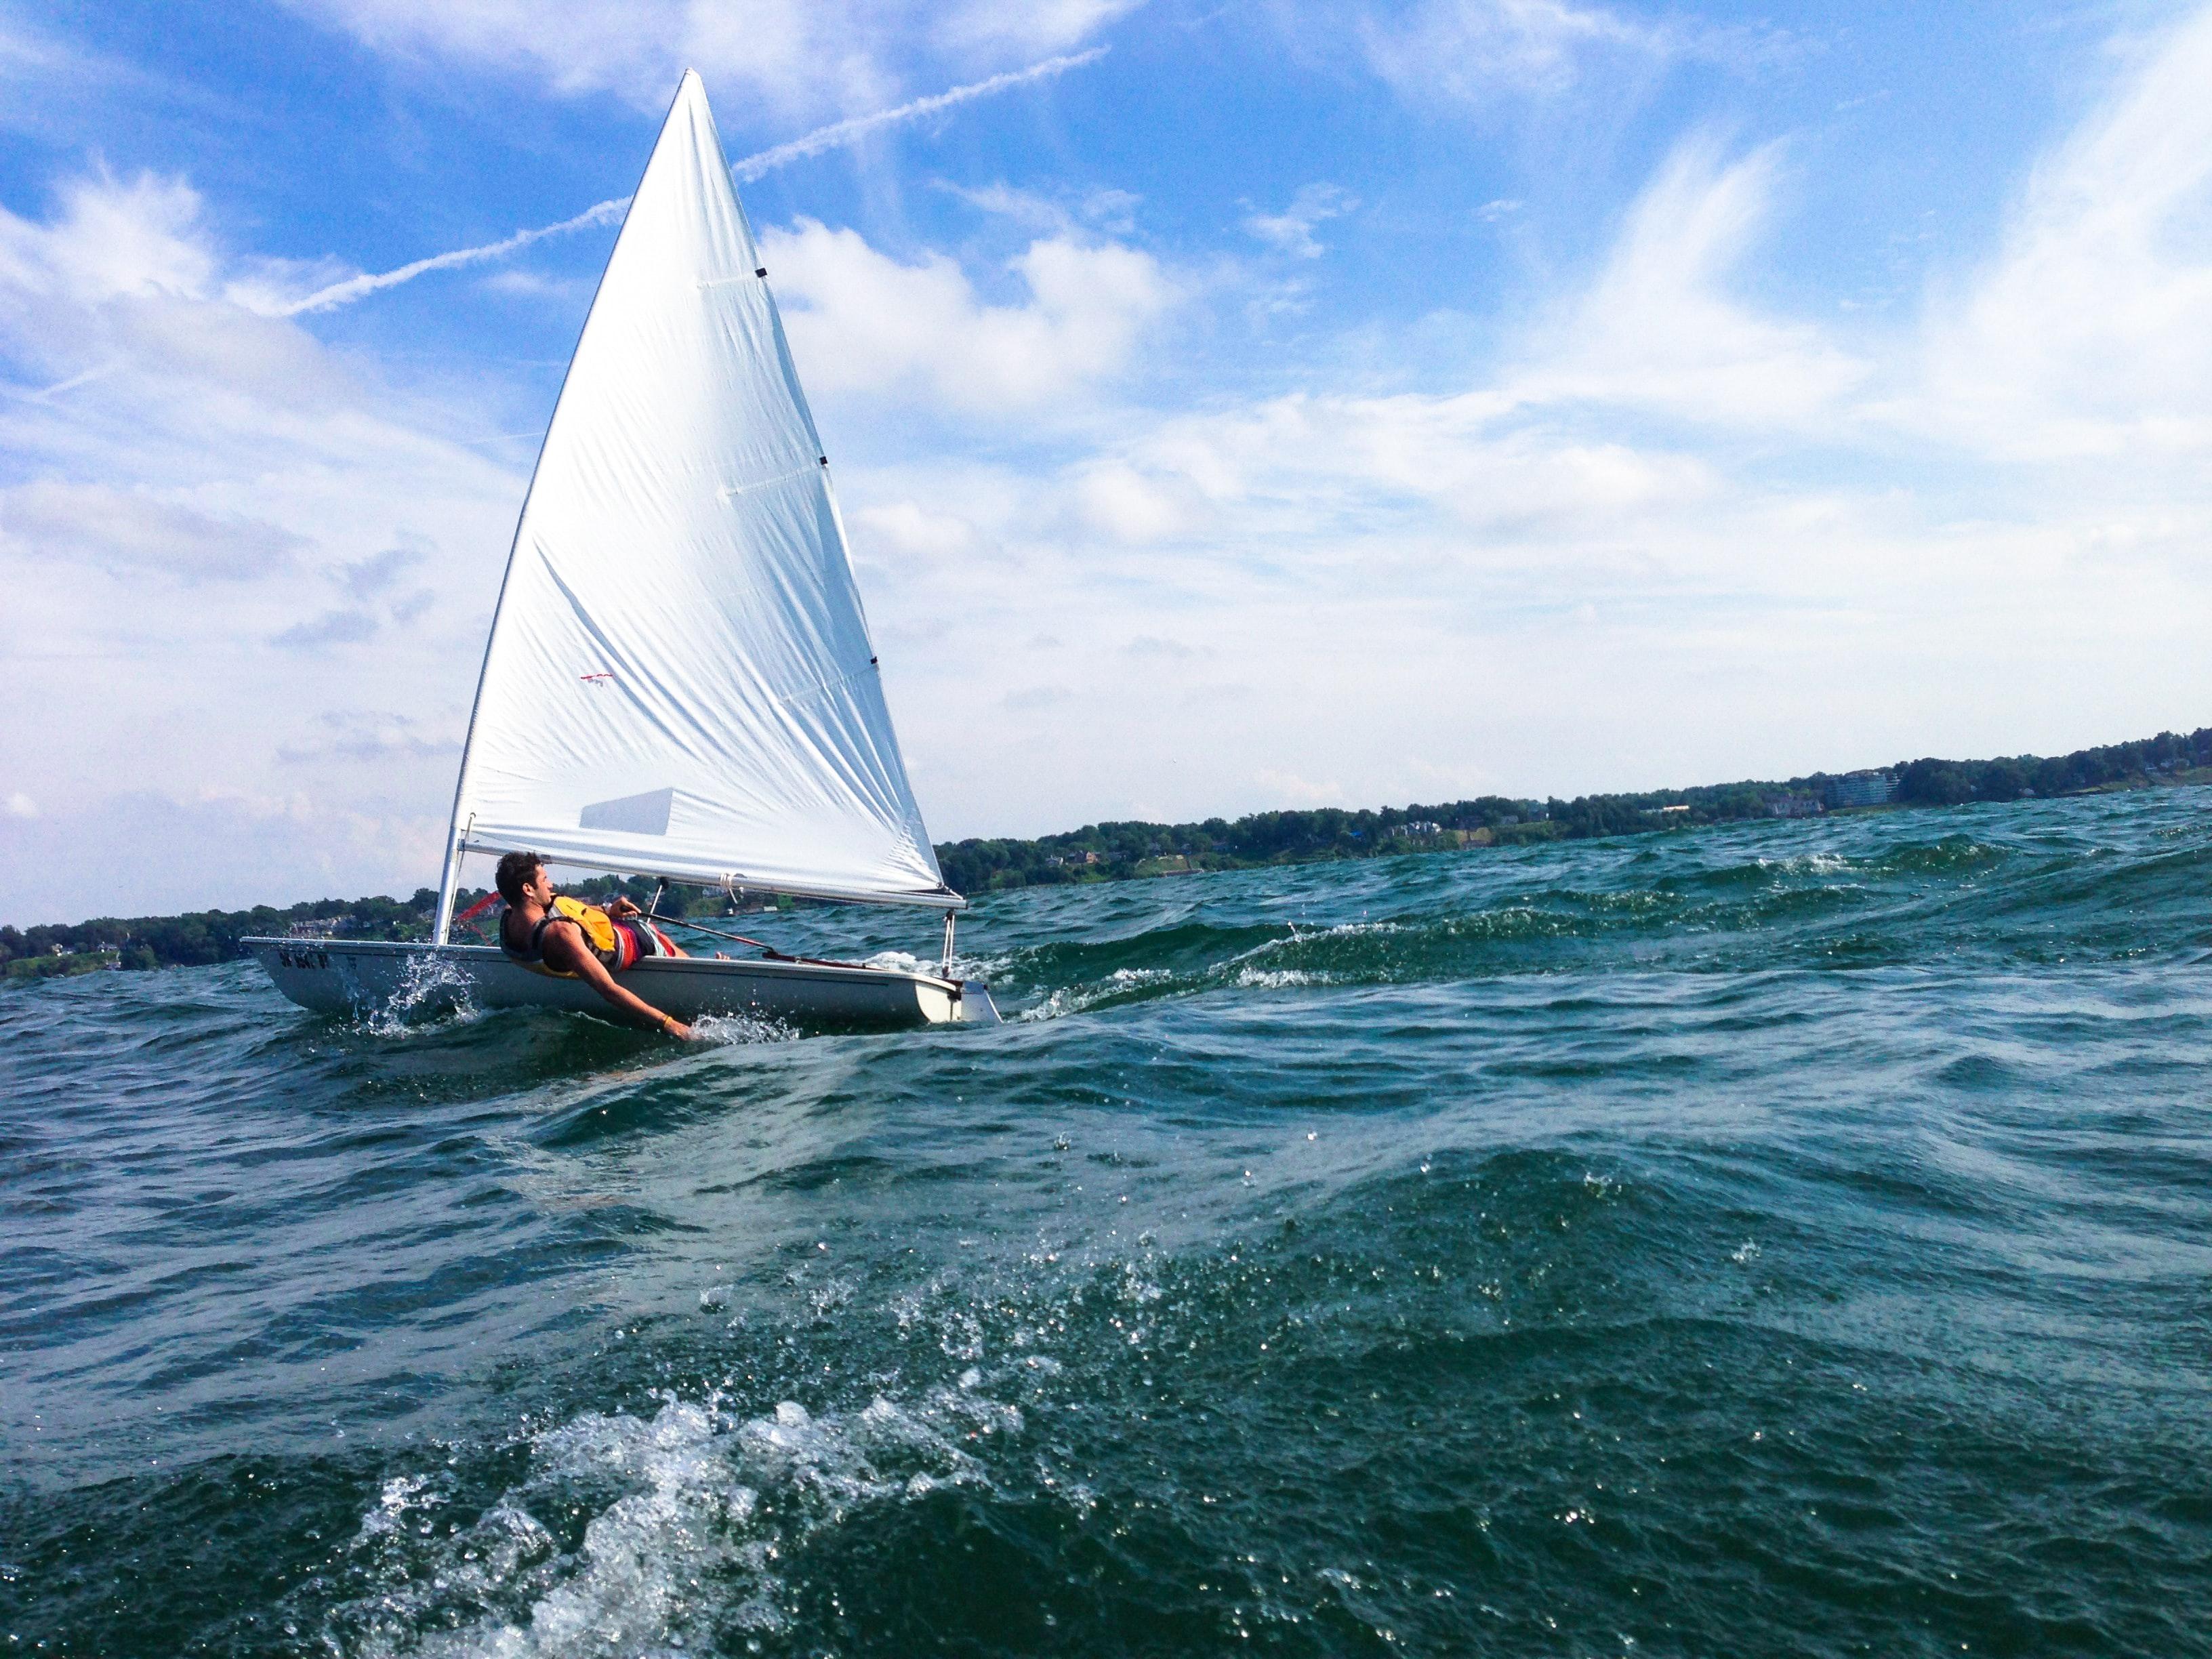 Sailing at boat at camp in America.